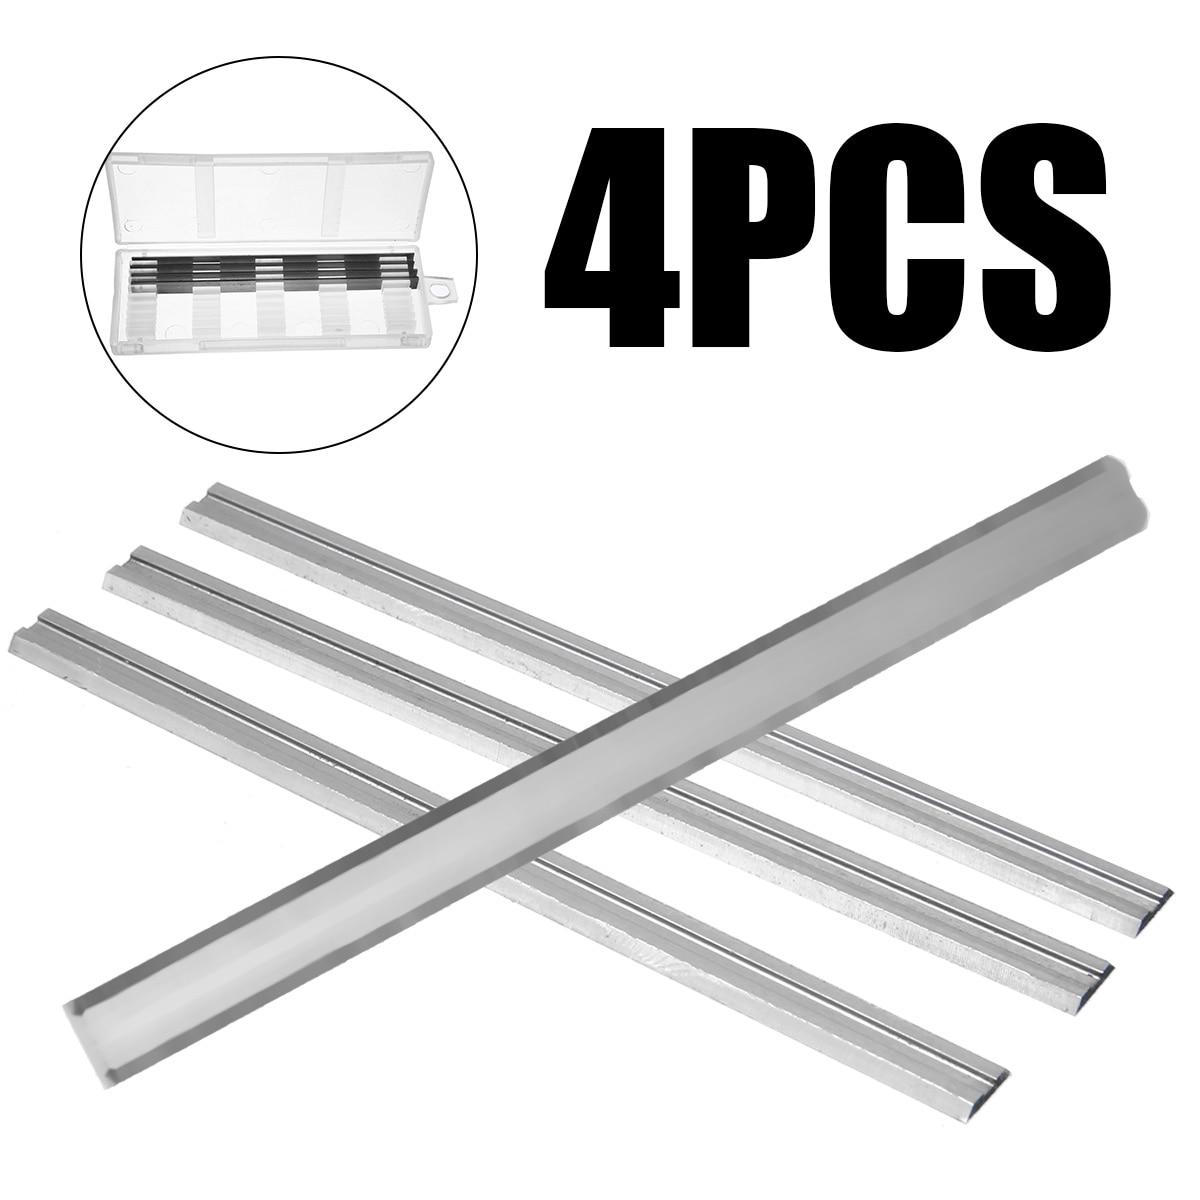 4pcs Portable Planer Knife 82mm PHO 25-82 / PHO 200 / PHO 16-82 / B34 HM Carbide  82*5.5*1.1mm High Quality